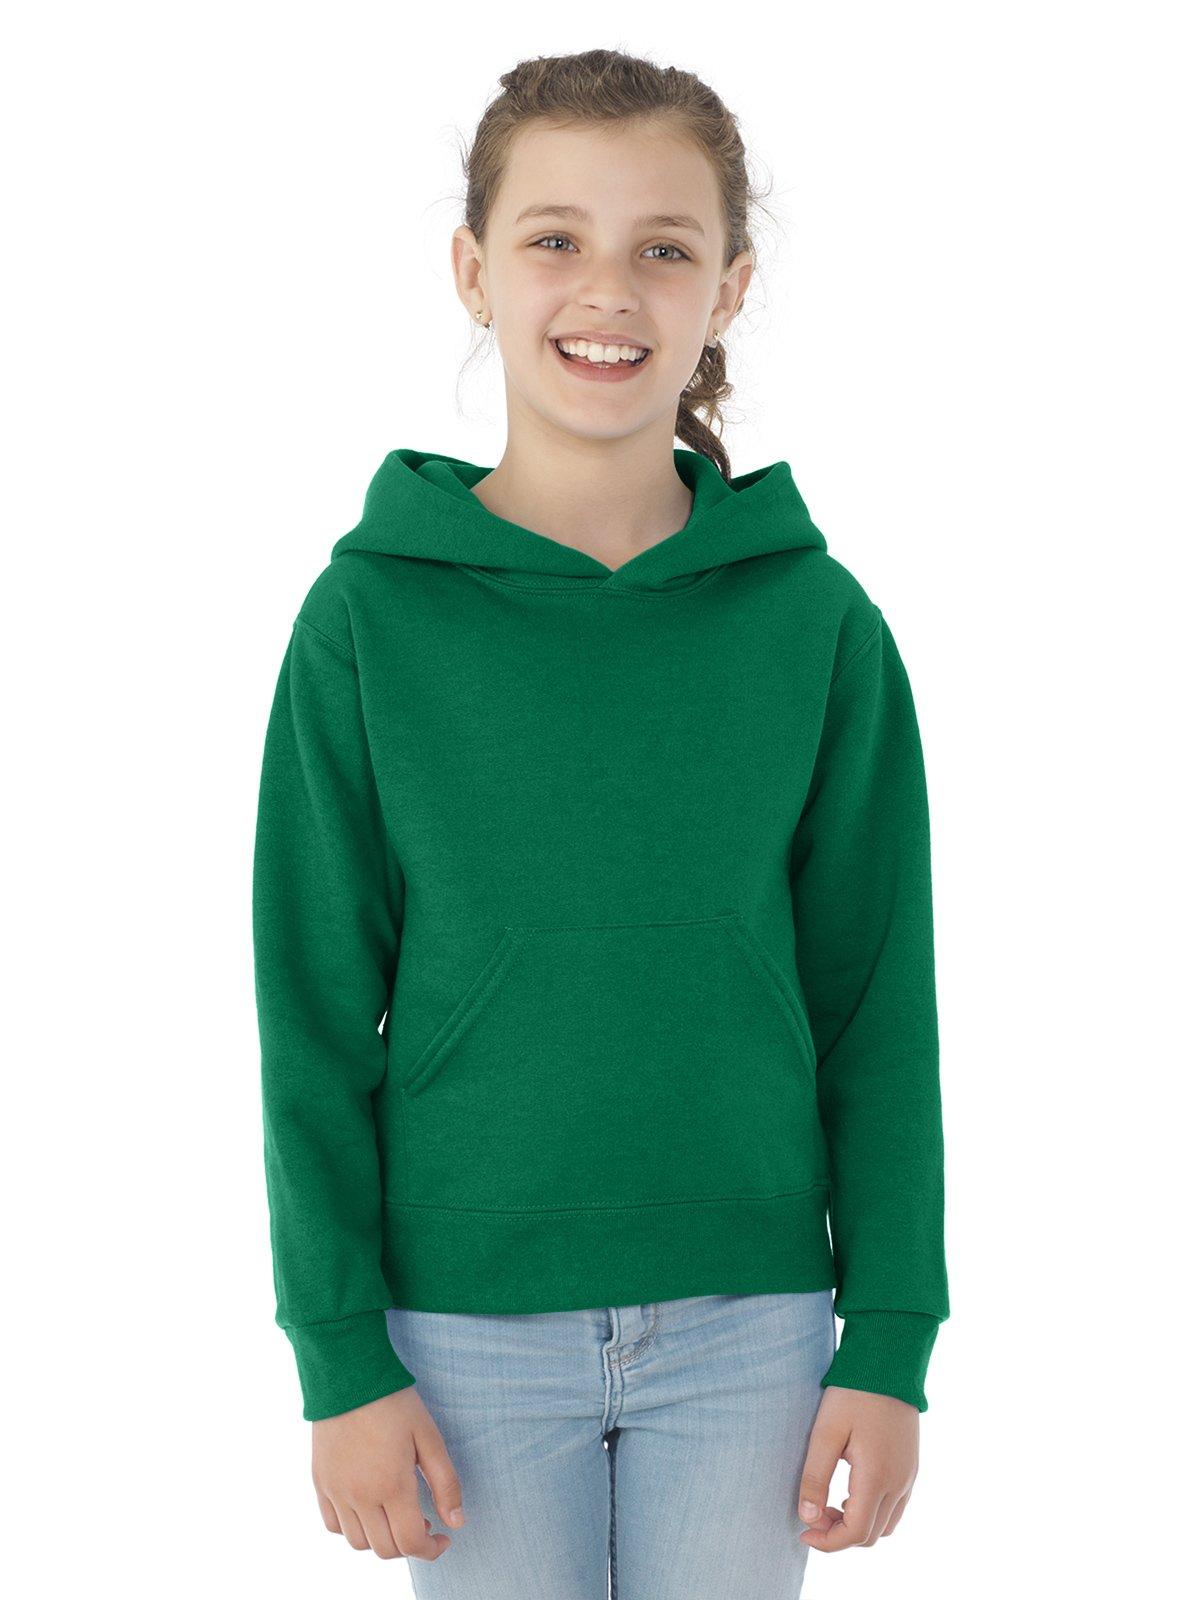 Jerzees 996Y Youth NuBlend Hooded Pullover Sweatshirt - Clover44; Medium